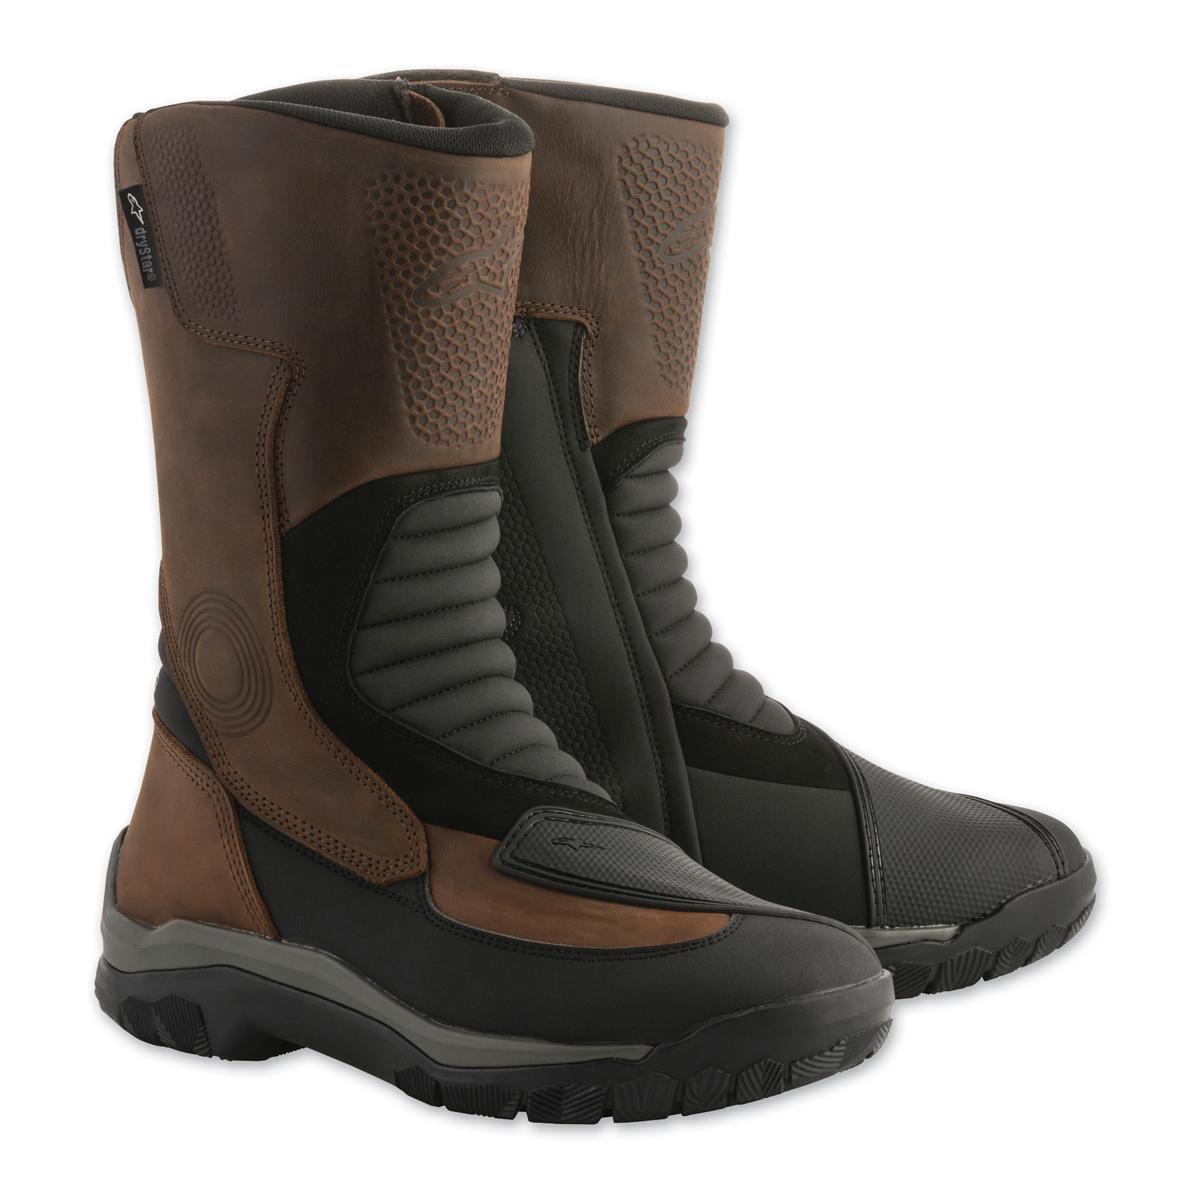 Alpinestars Men's Campeche Drystar Brown/Black Boots